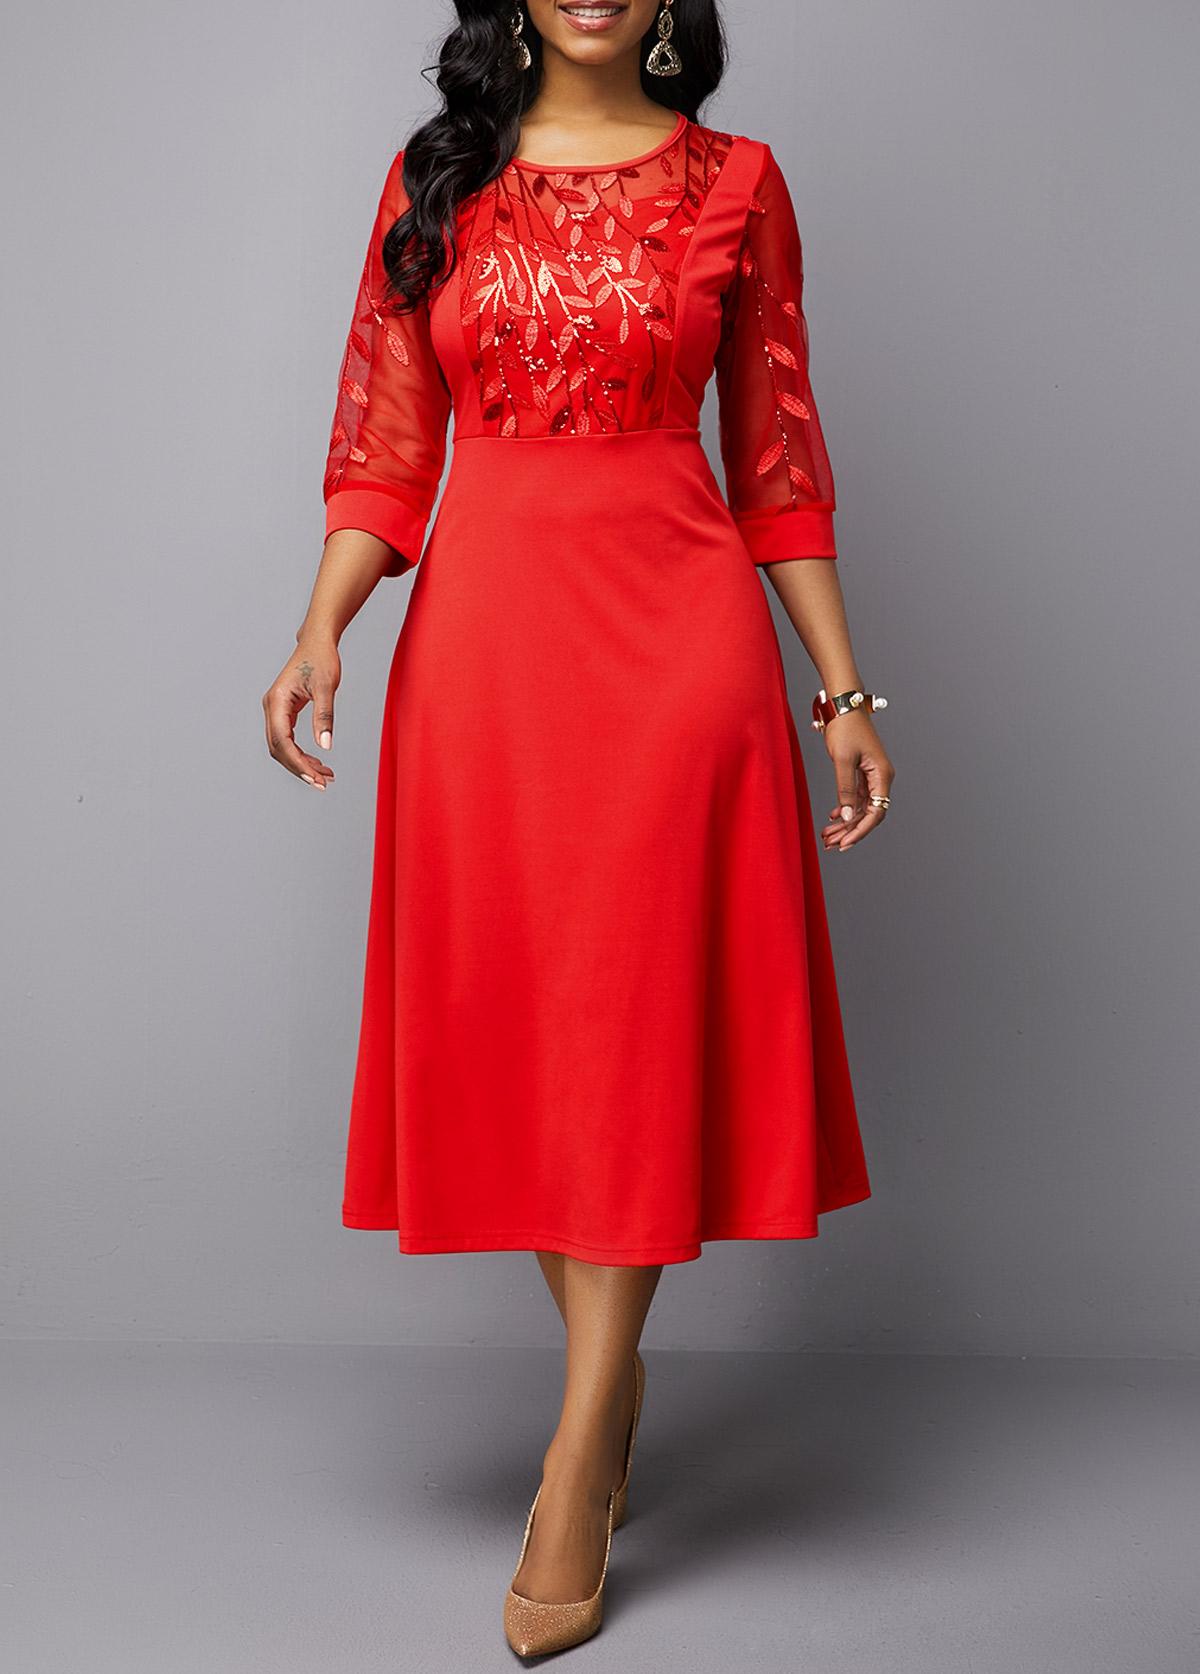 ROTITA Embroidered Mesh Panel Red Round Neck Dress